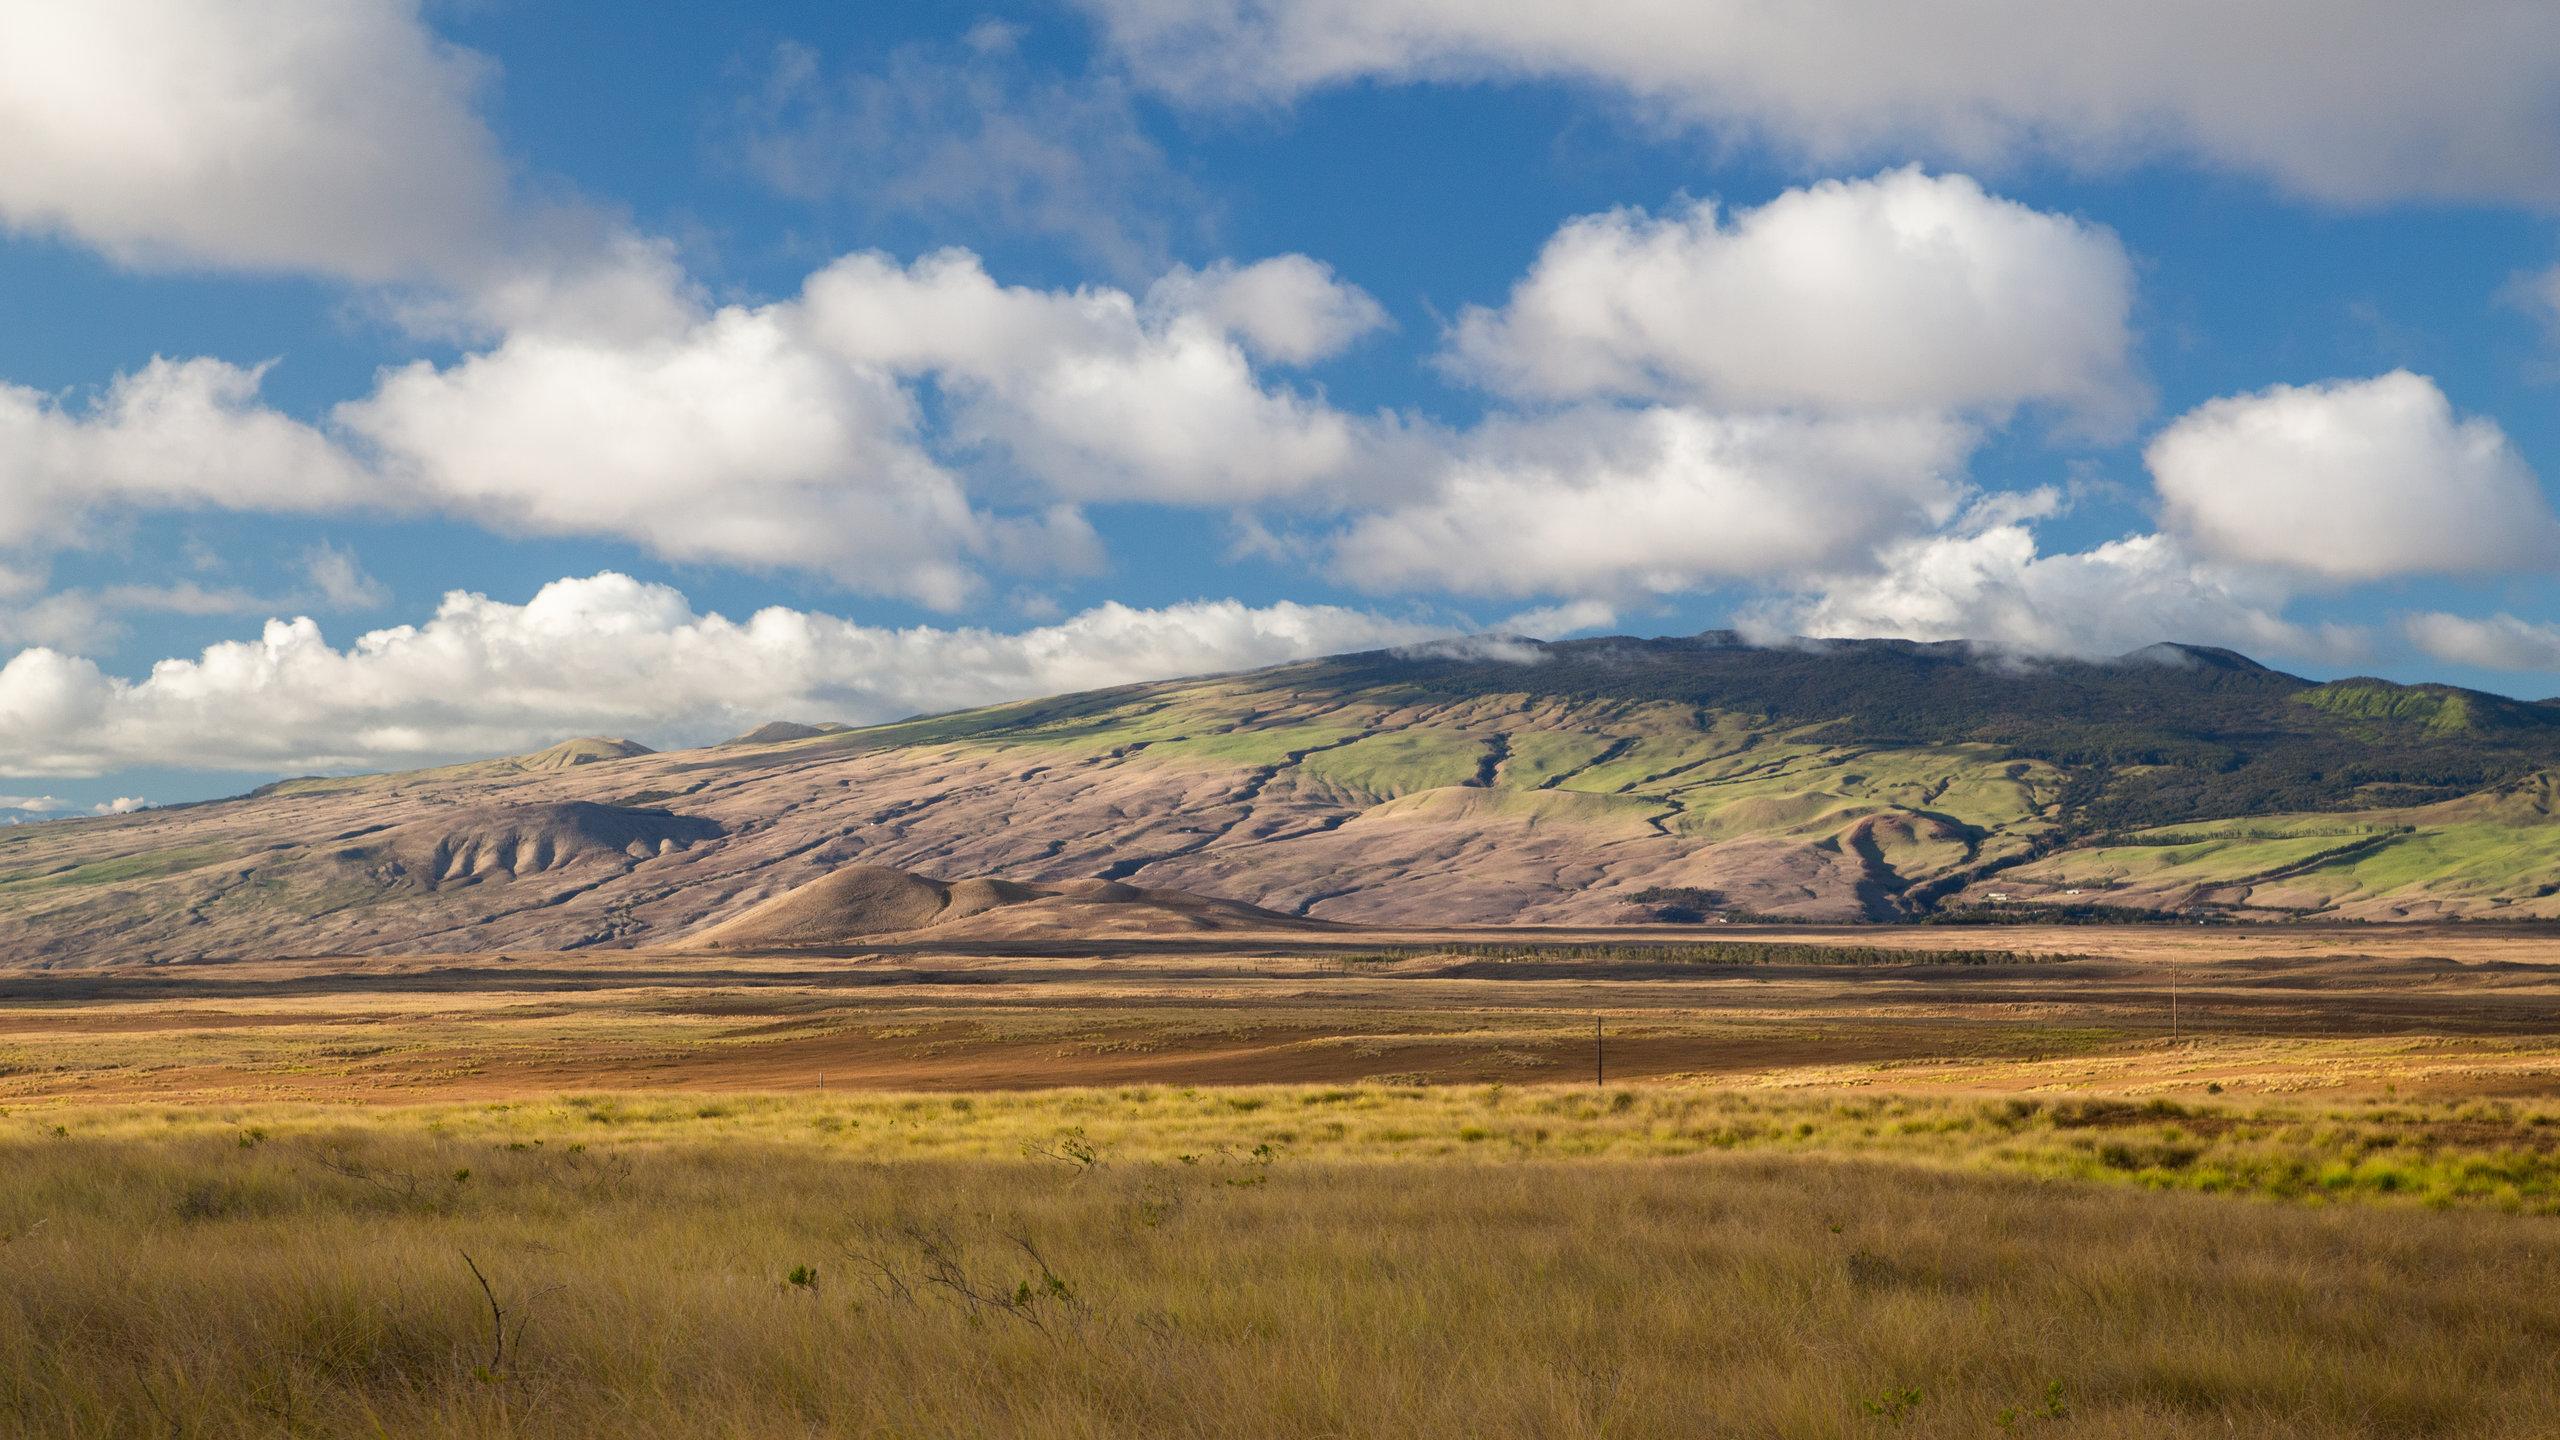 Kamuela, Hawaii, USA